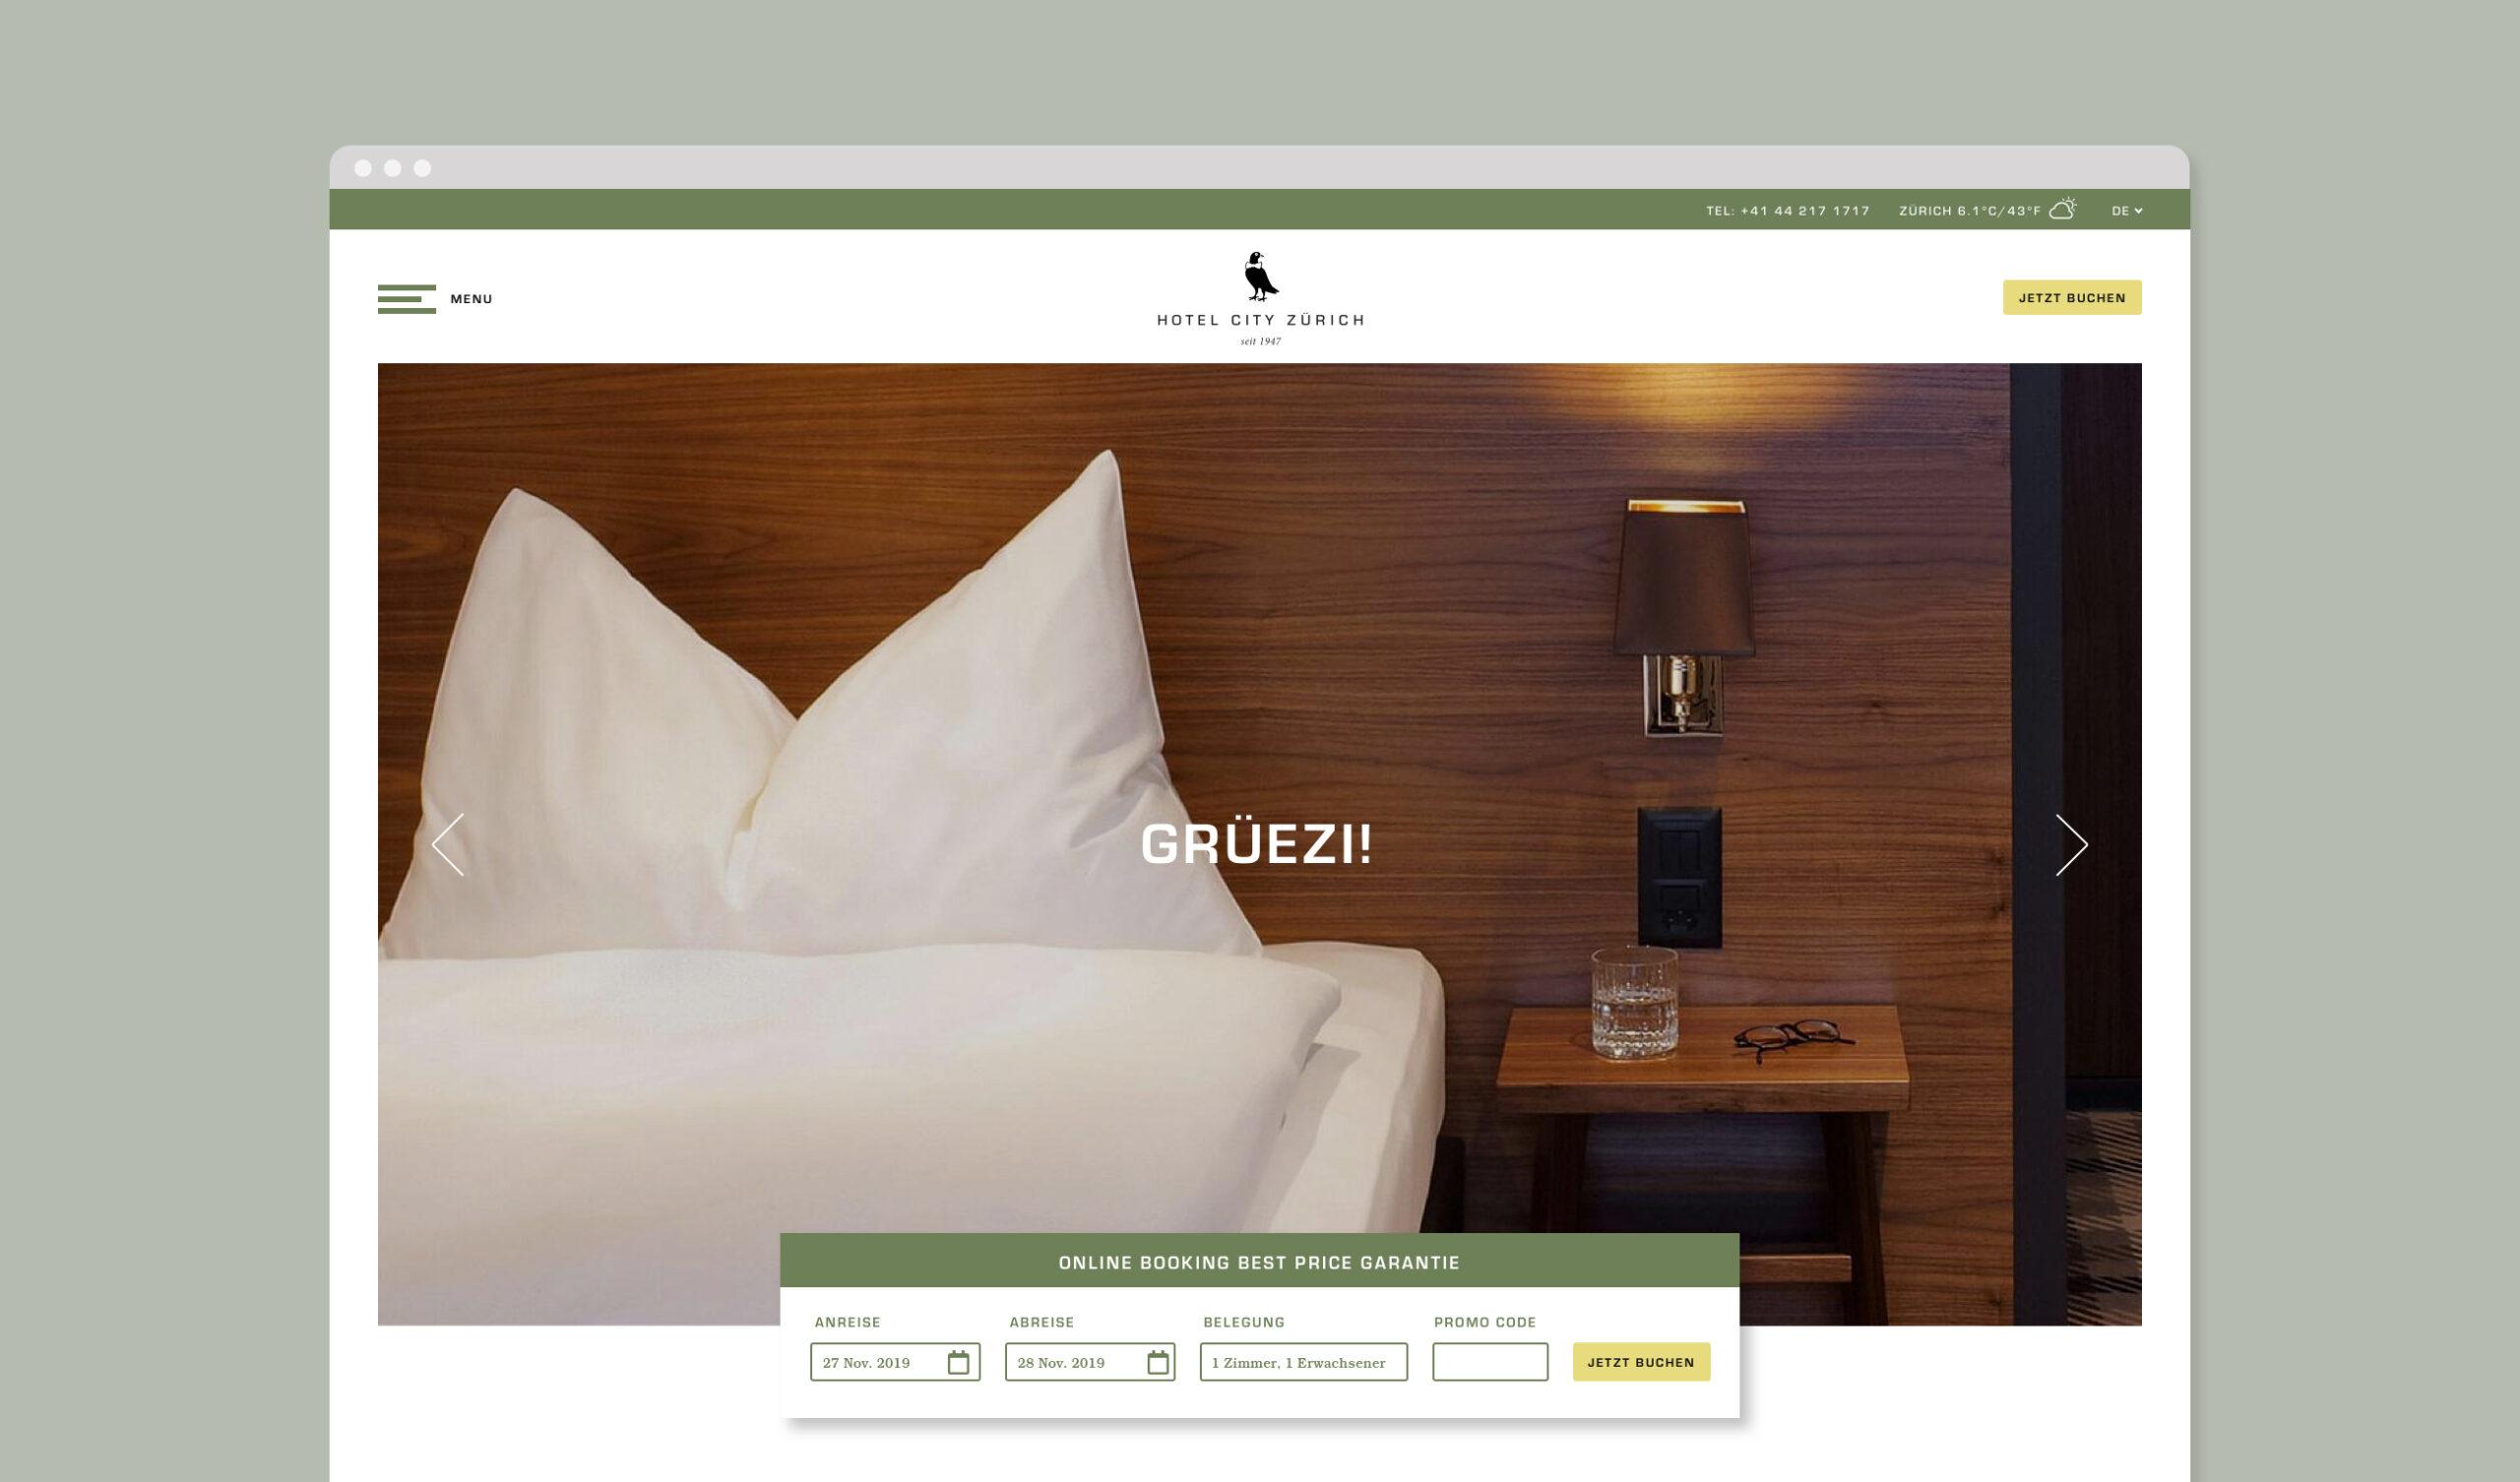 Hotel City Zurich website home screen